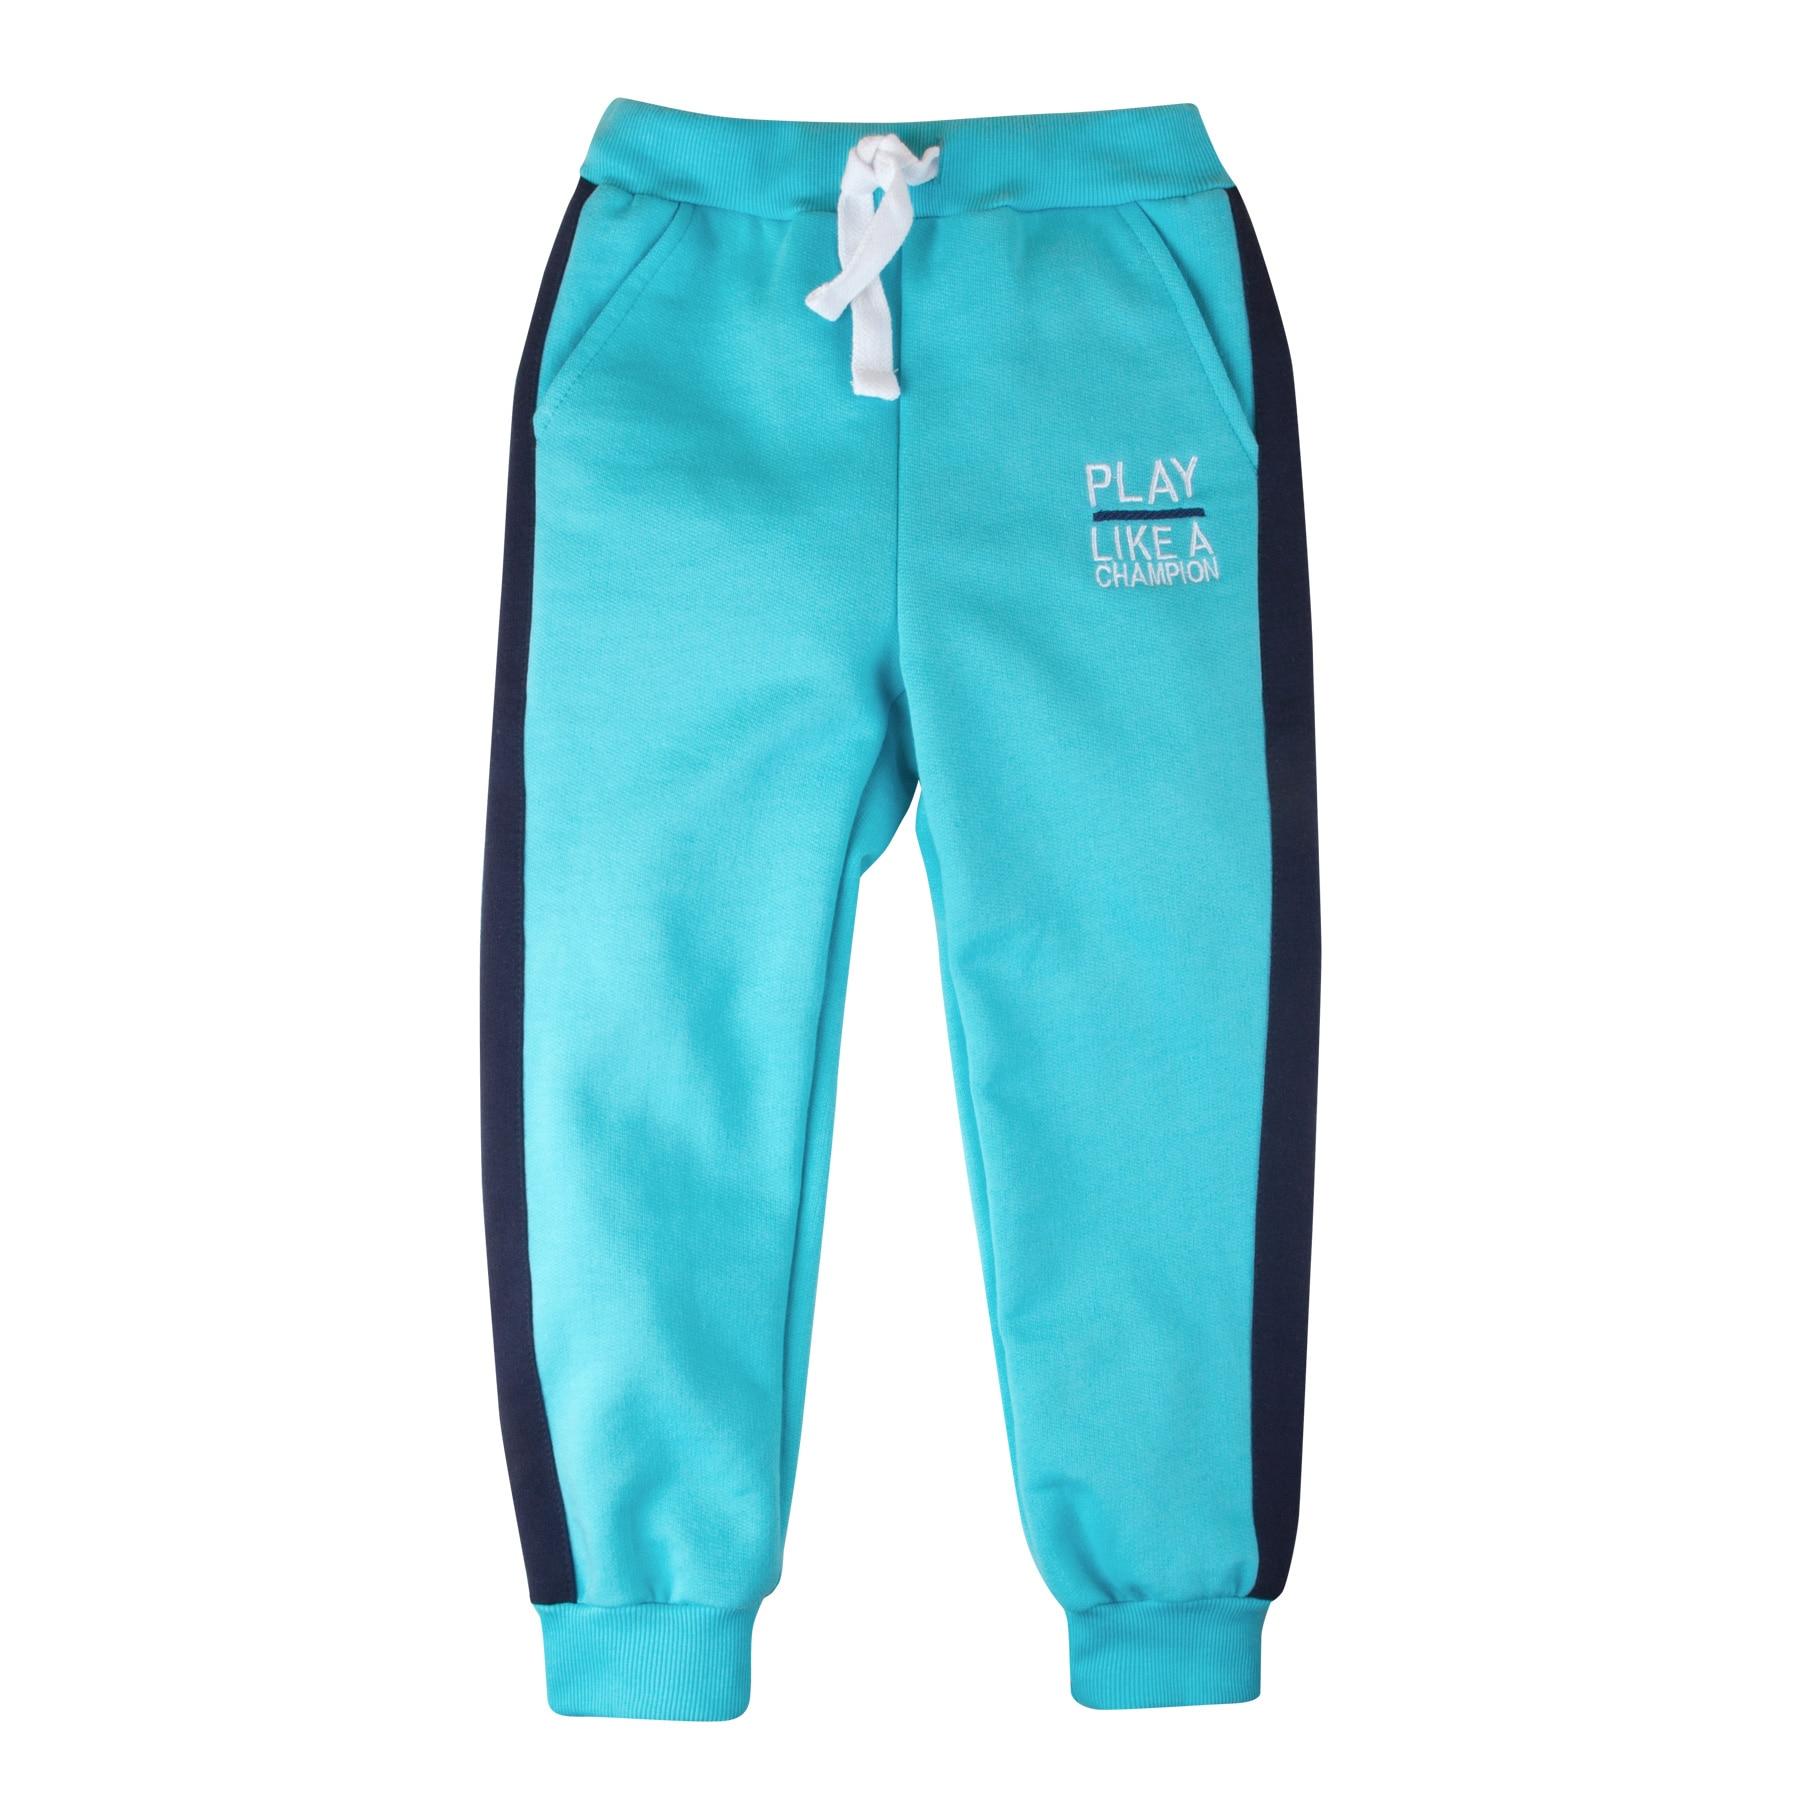 Pants for girls BOSSA NOVA 487B-462b kid clothes pants for girls bossa nova 487b 462b kid clothes